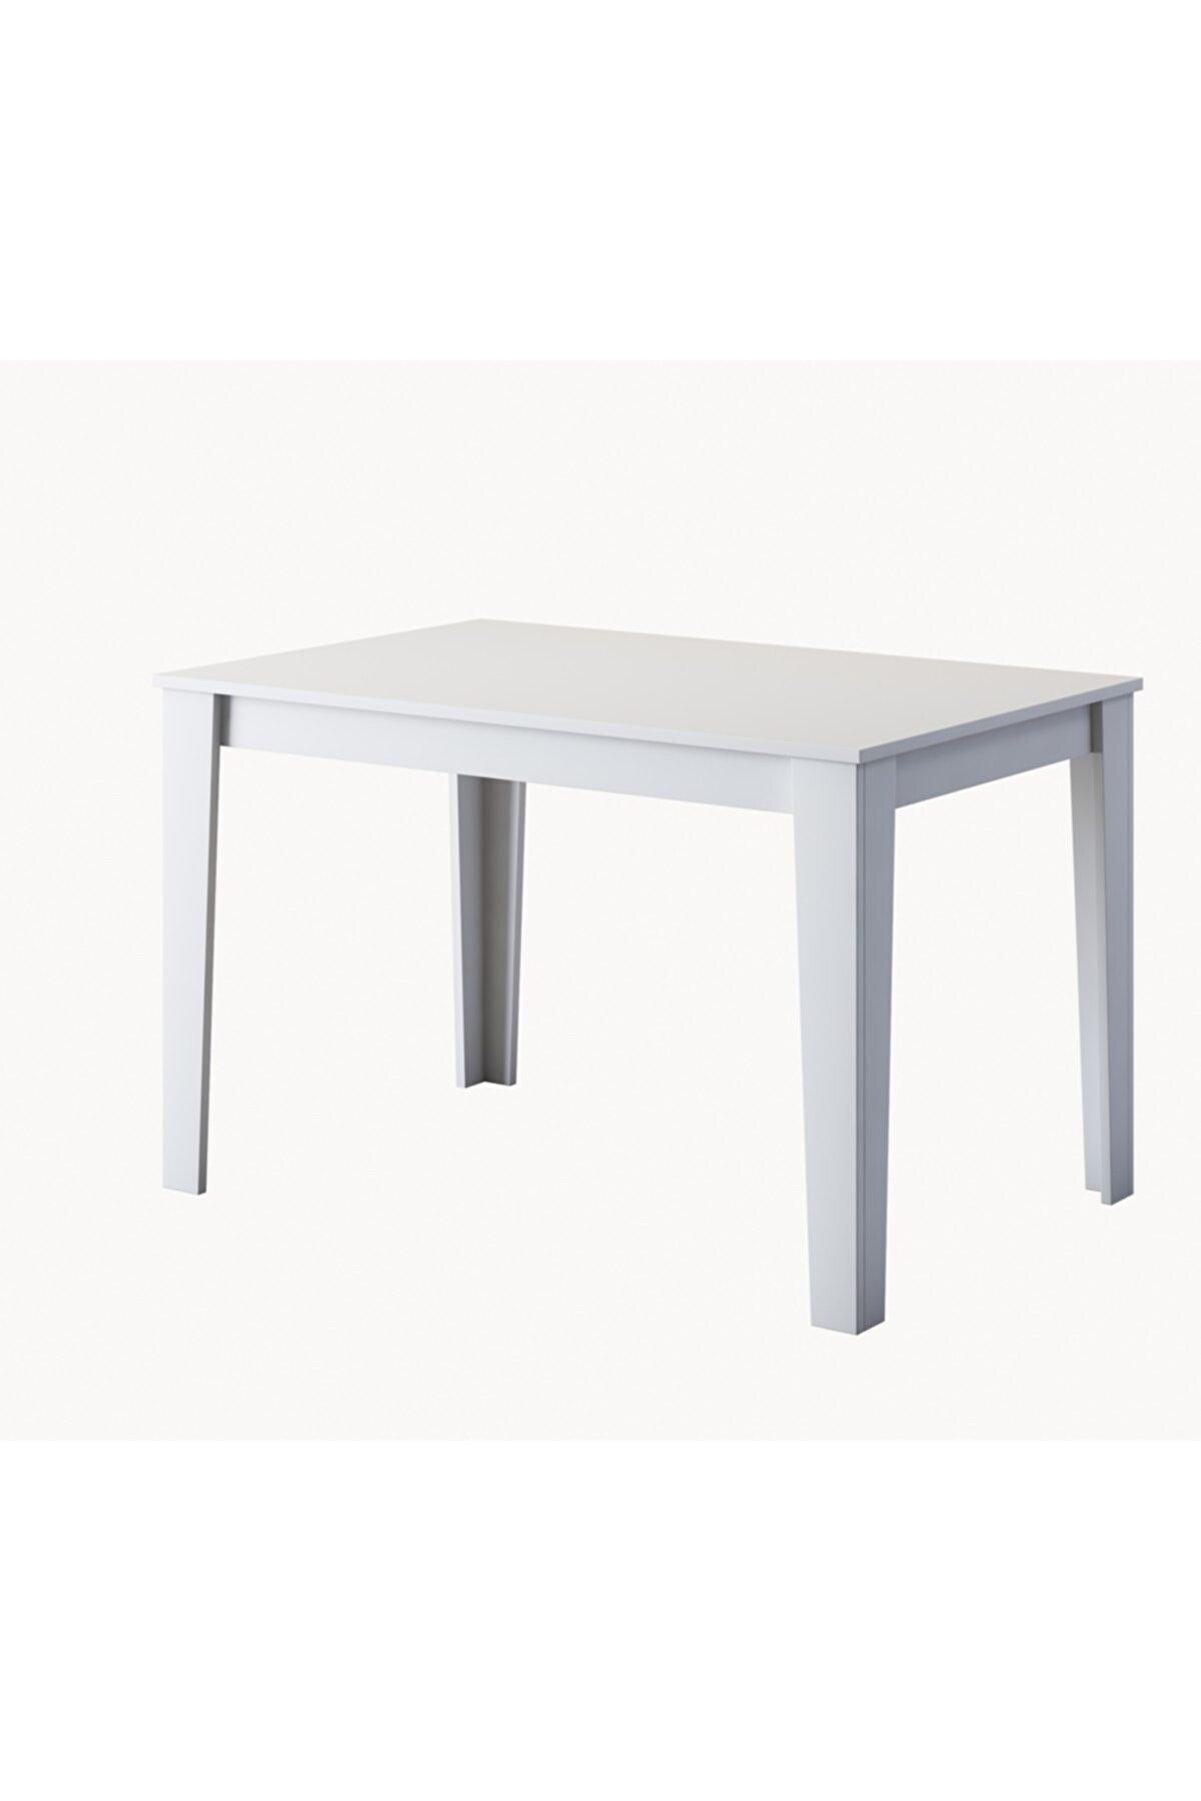 Rani Mobilya Rani T1 Mutfak Masası 110 cm Beyaz M2